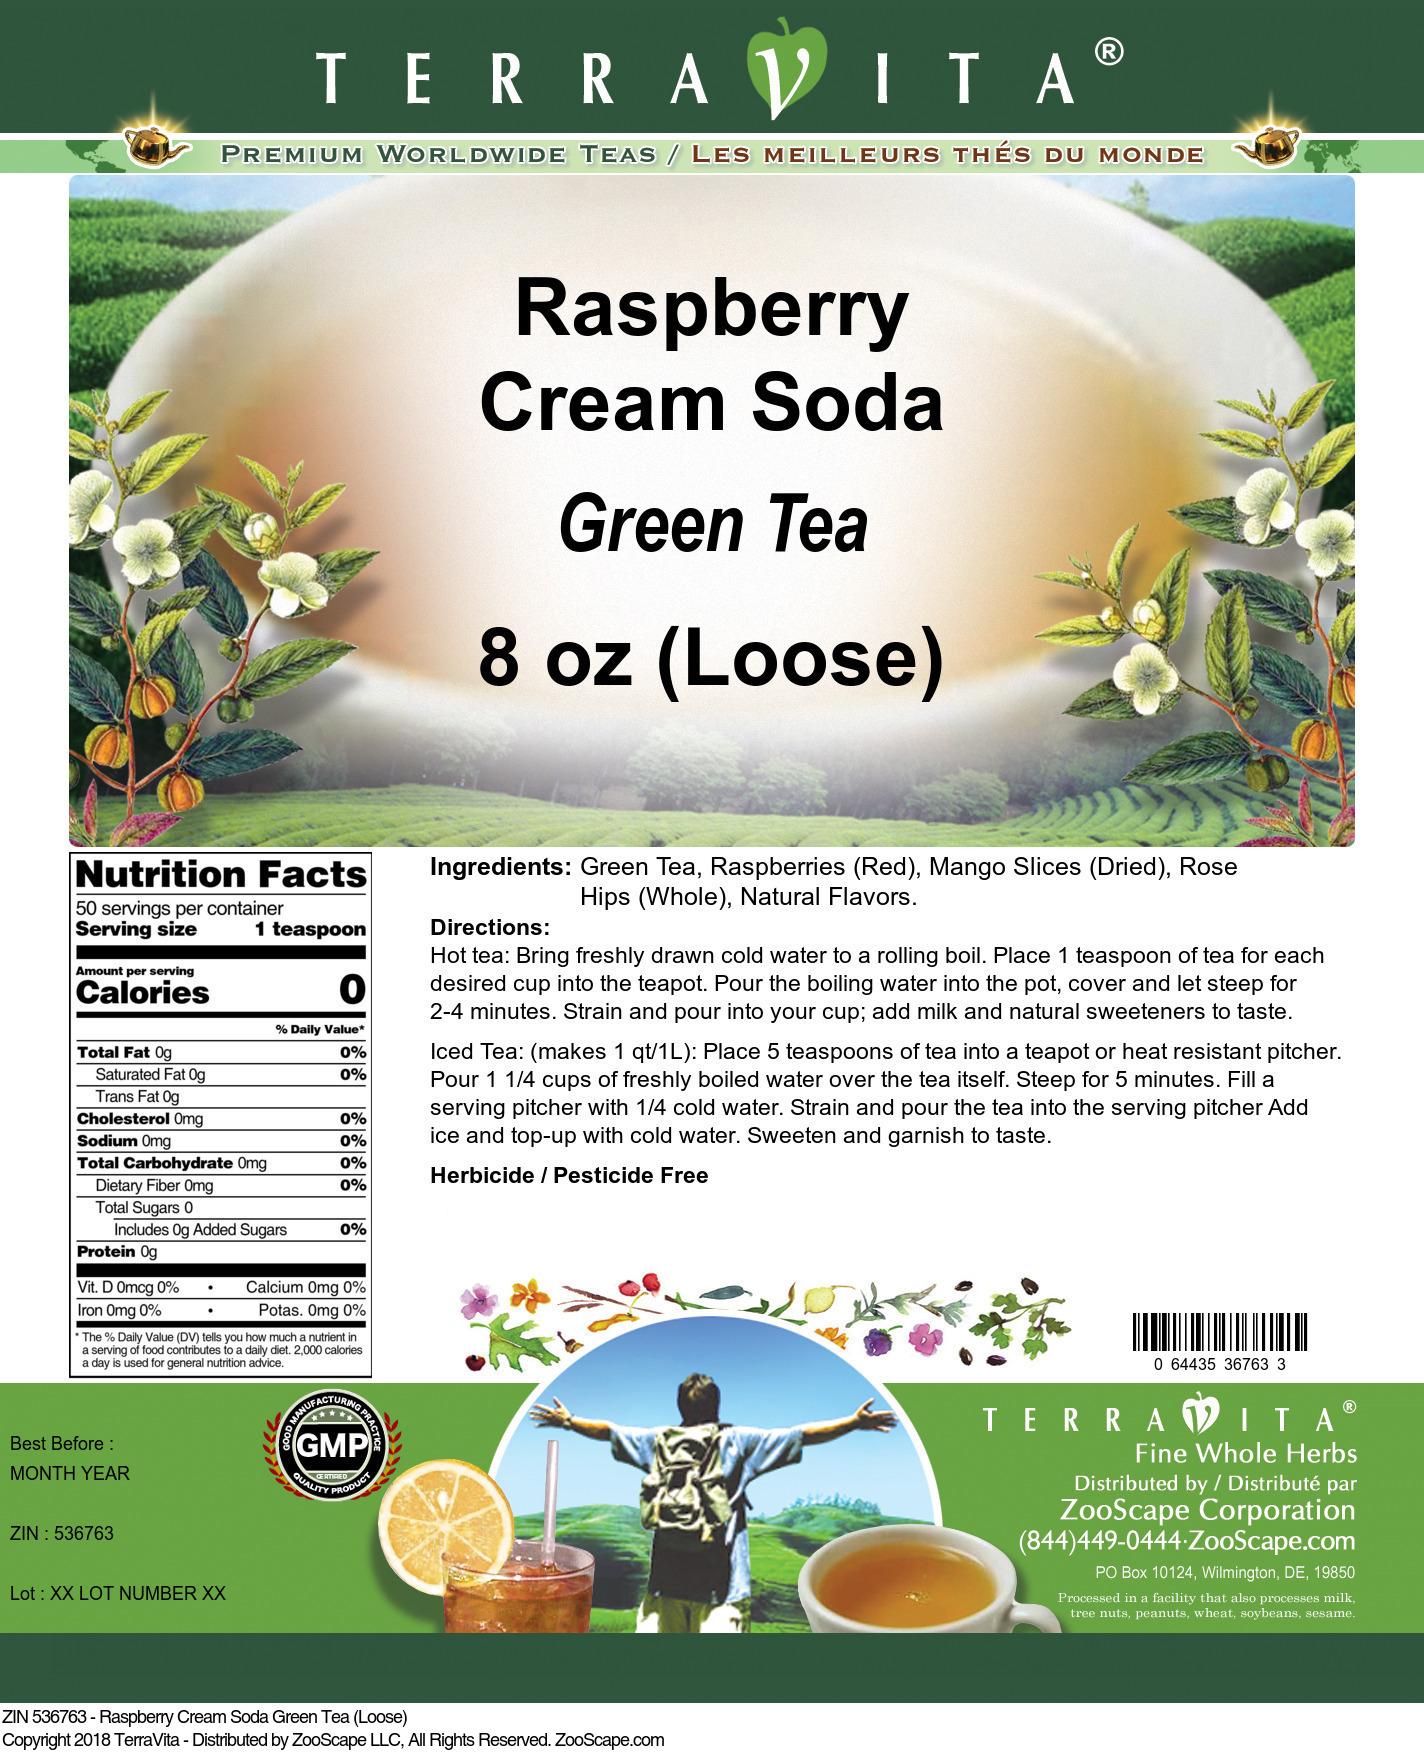 Raspberry Cream Soda Green Tea (Loose)